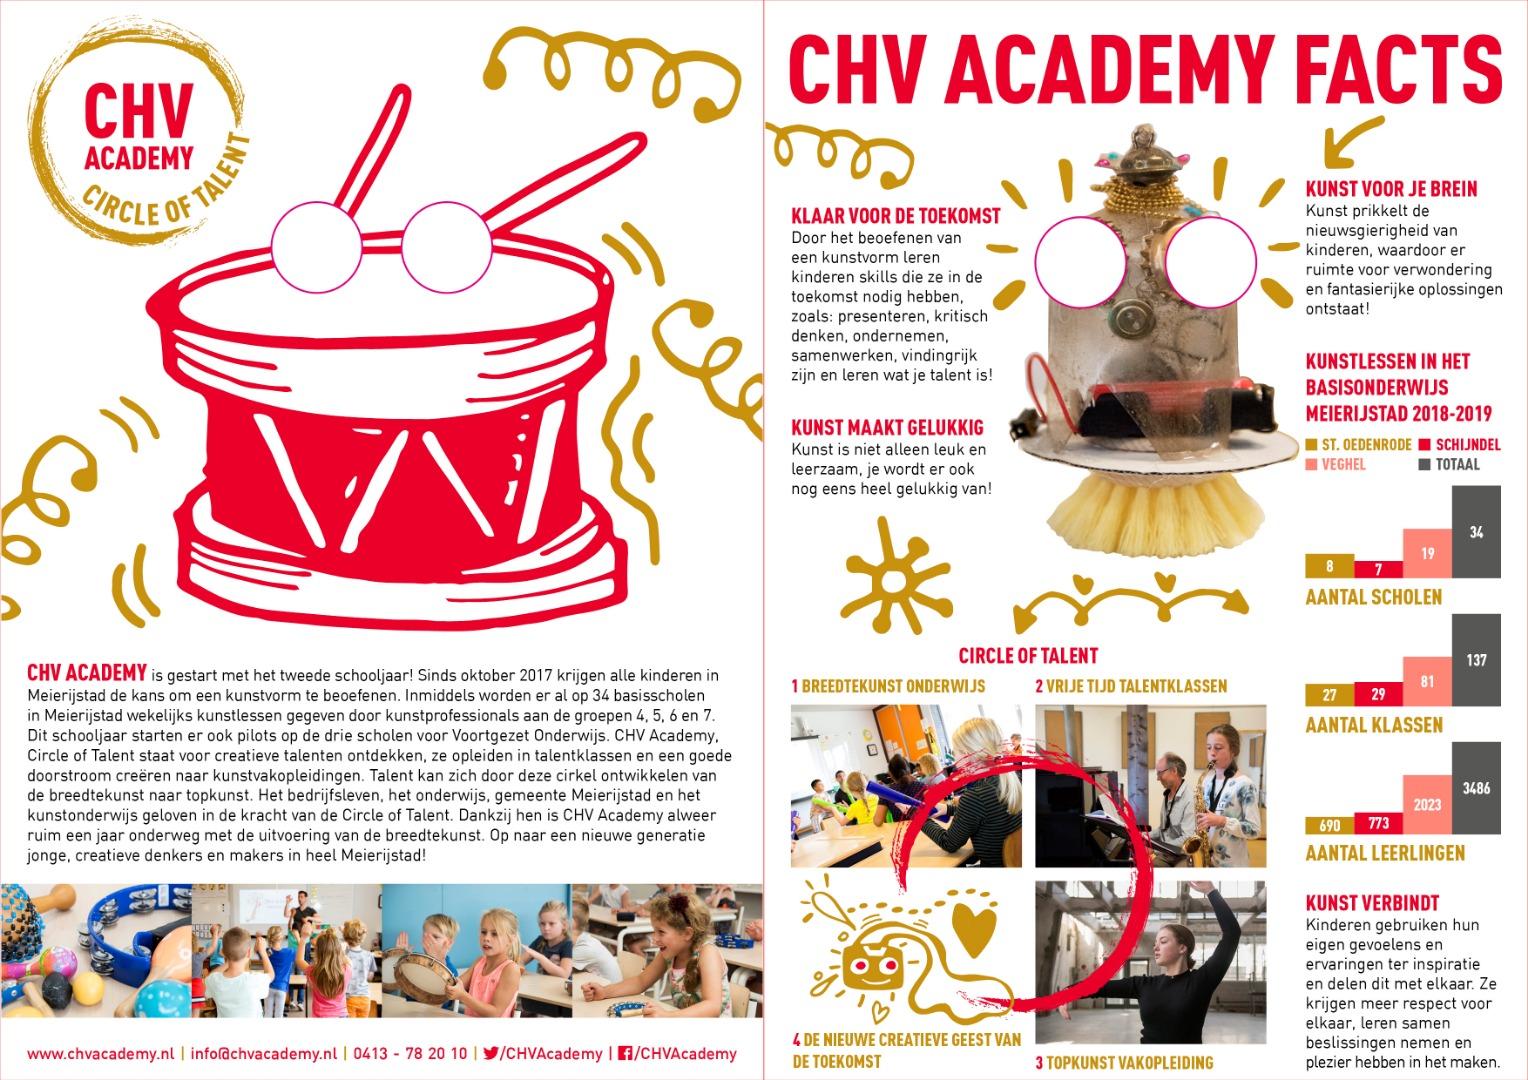 CHV Academy